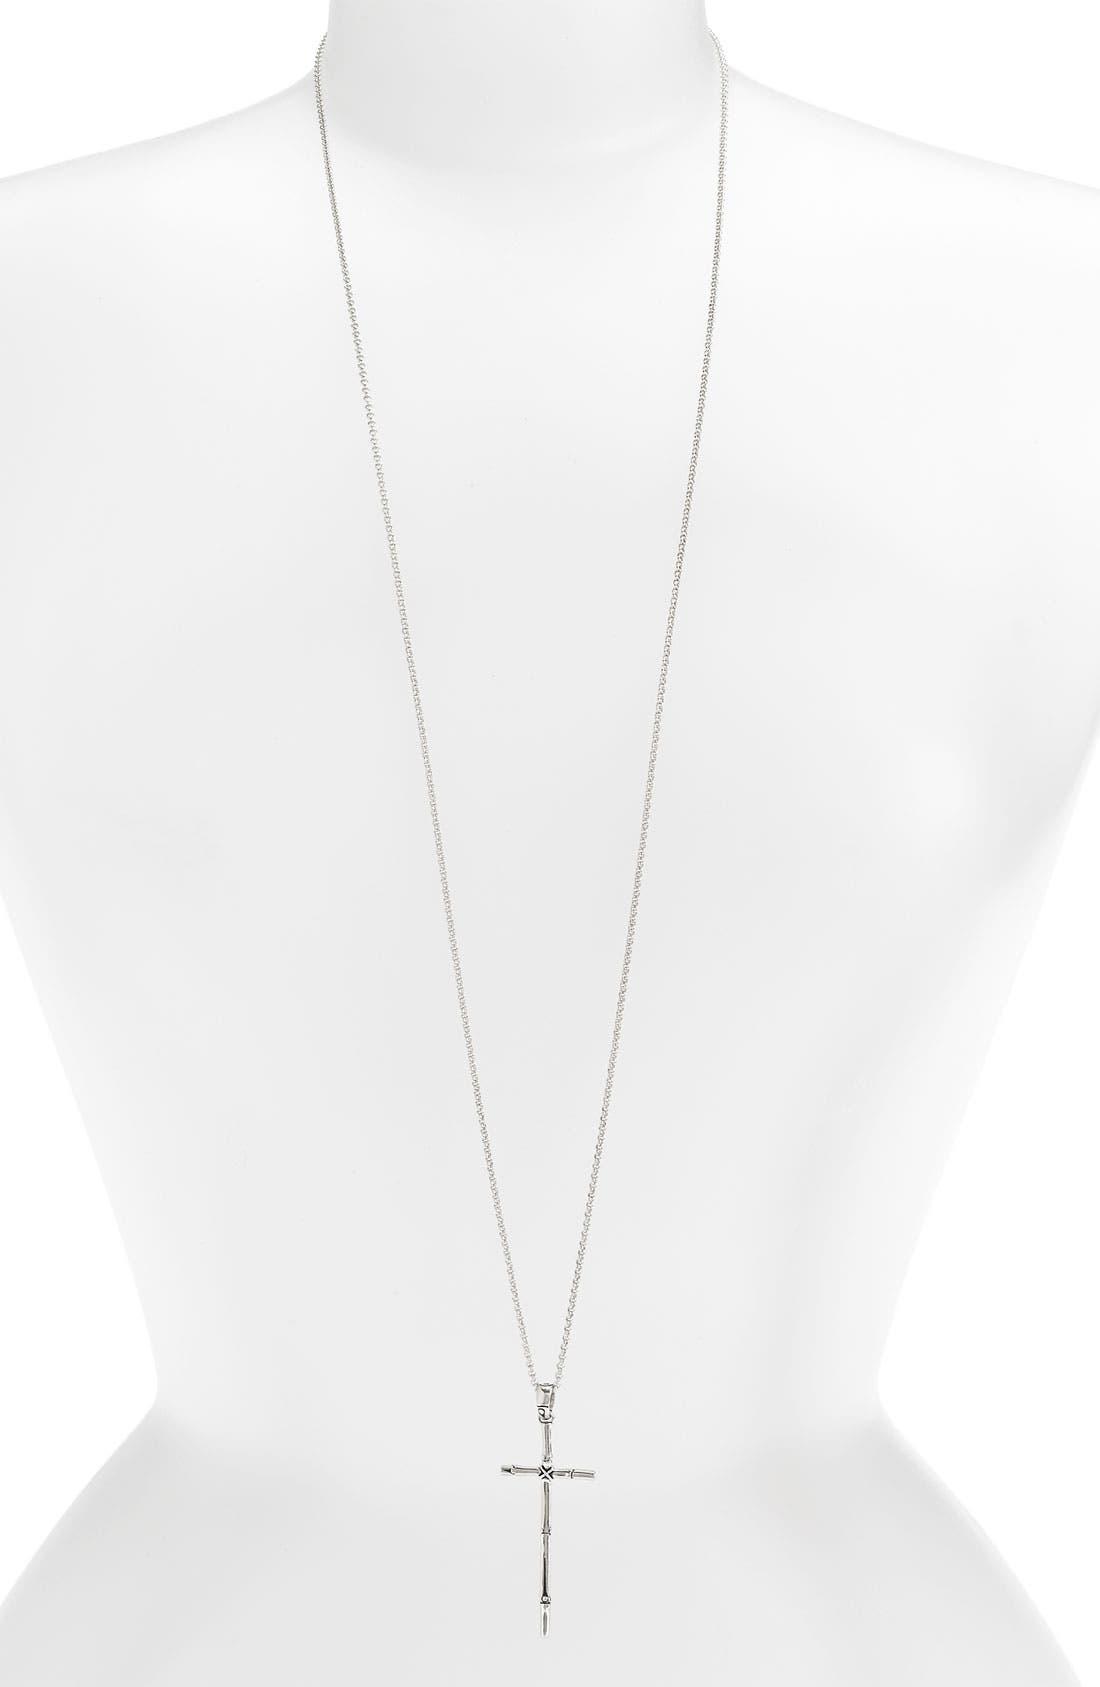 Alternate Image 1 Selected - John Hardy 'Bamboo' Long Cross Pendant Necklace